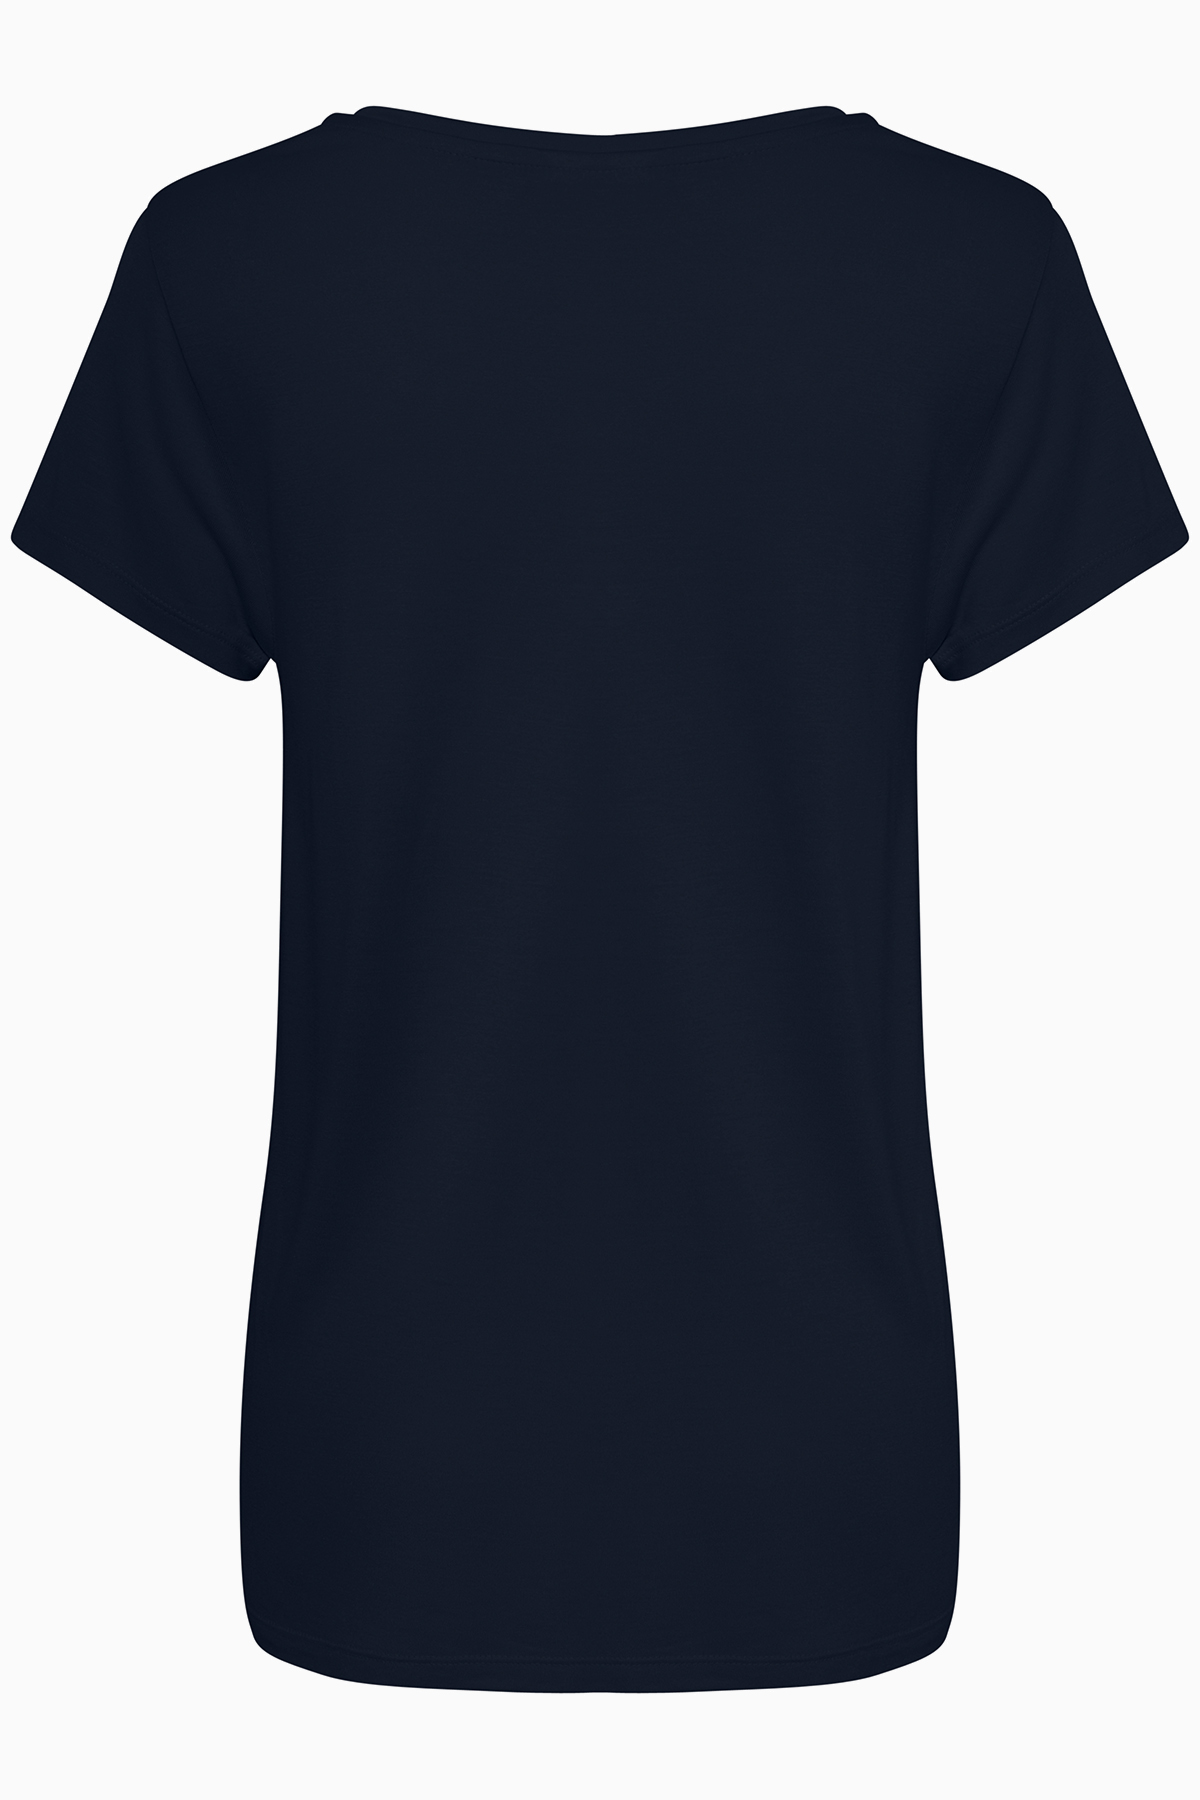 Marineblau Kurzarm T-Shirt von Kaffe – Shoppen Sie Marineblau Kurzarm T-Shirt ab Gr. XS-XXL hier